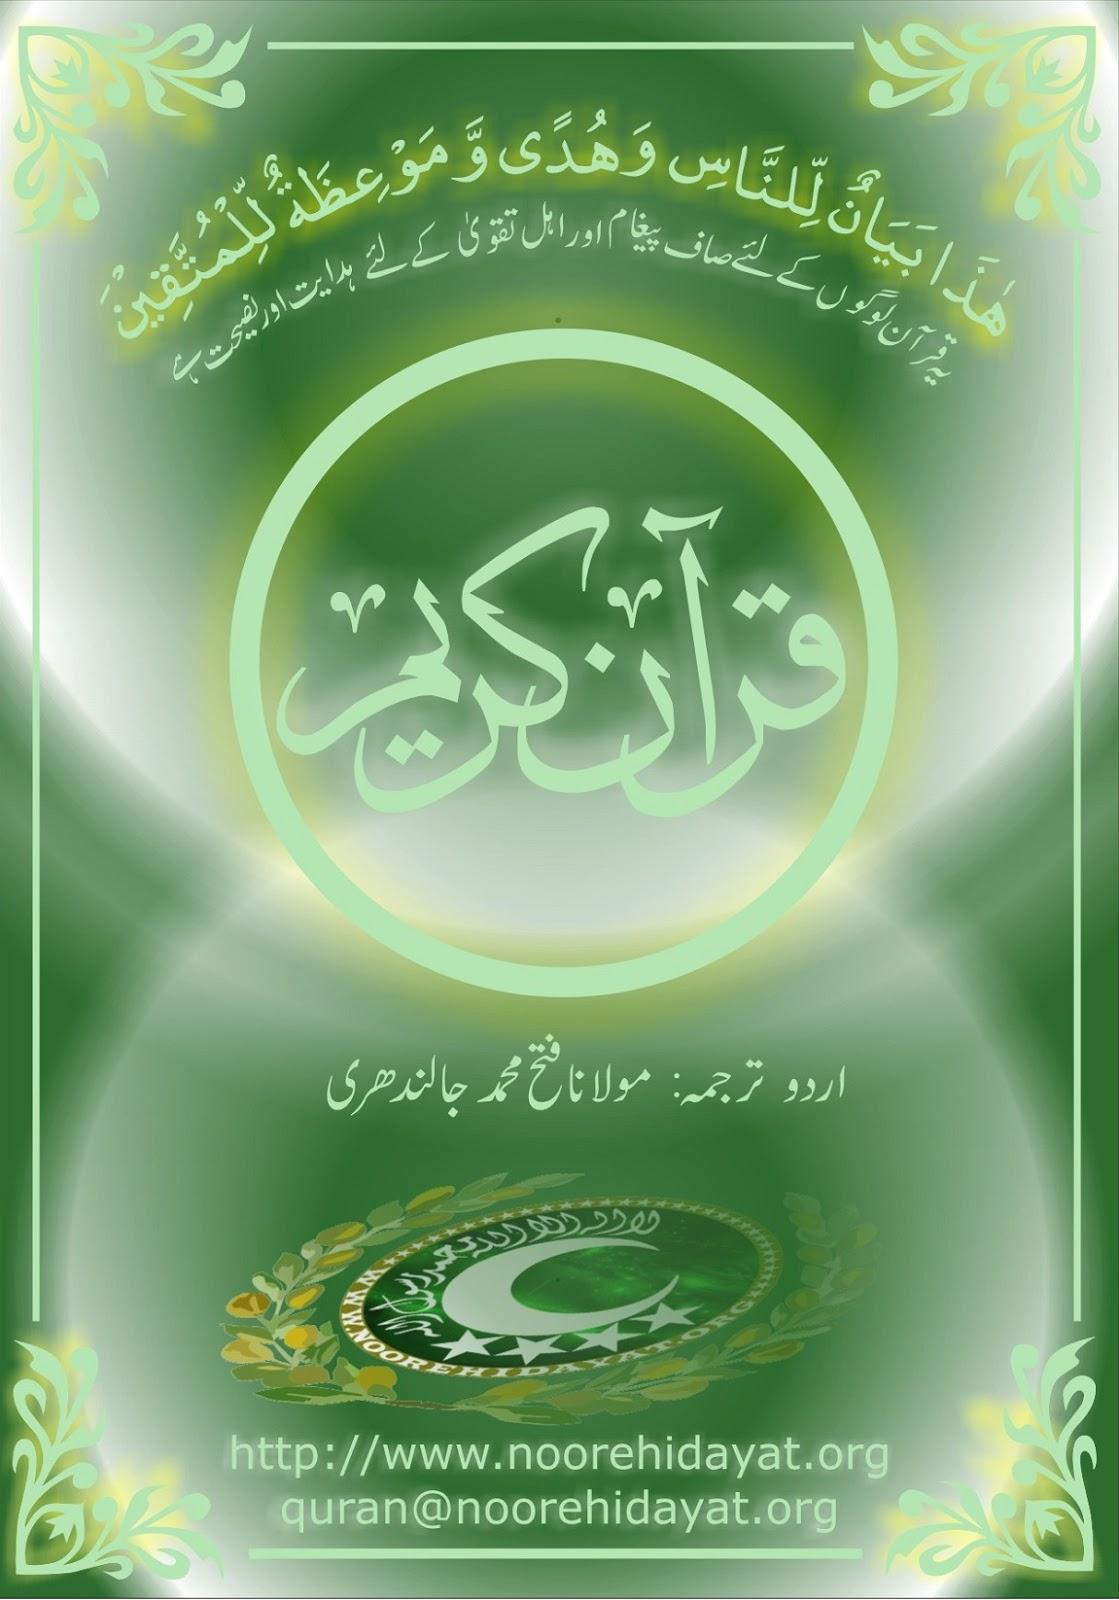 complete quran with urdu translation in pdf file